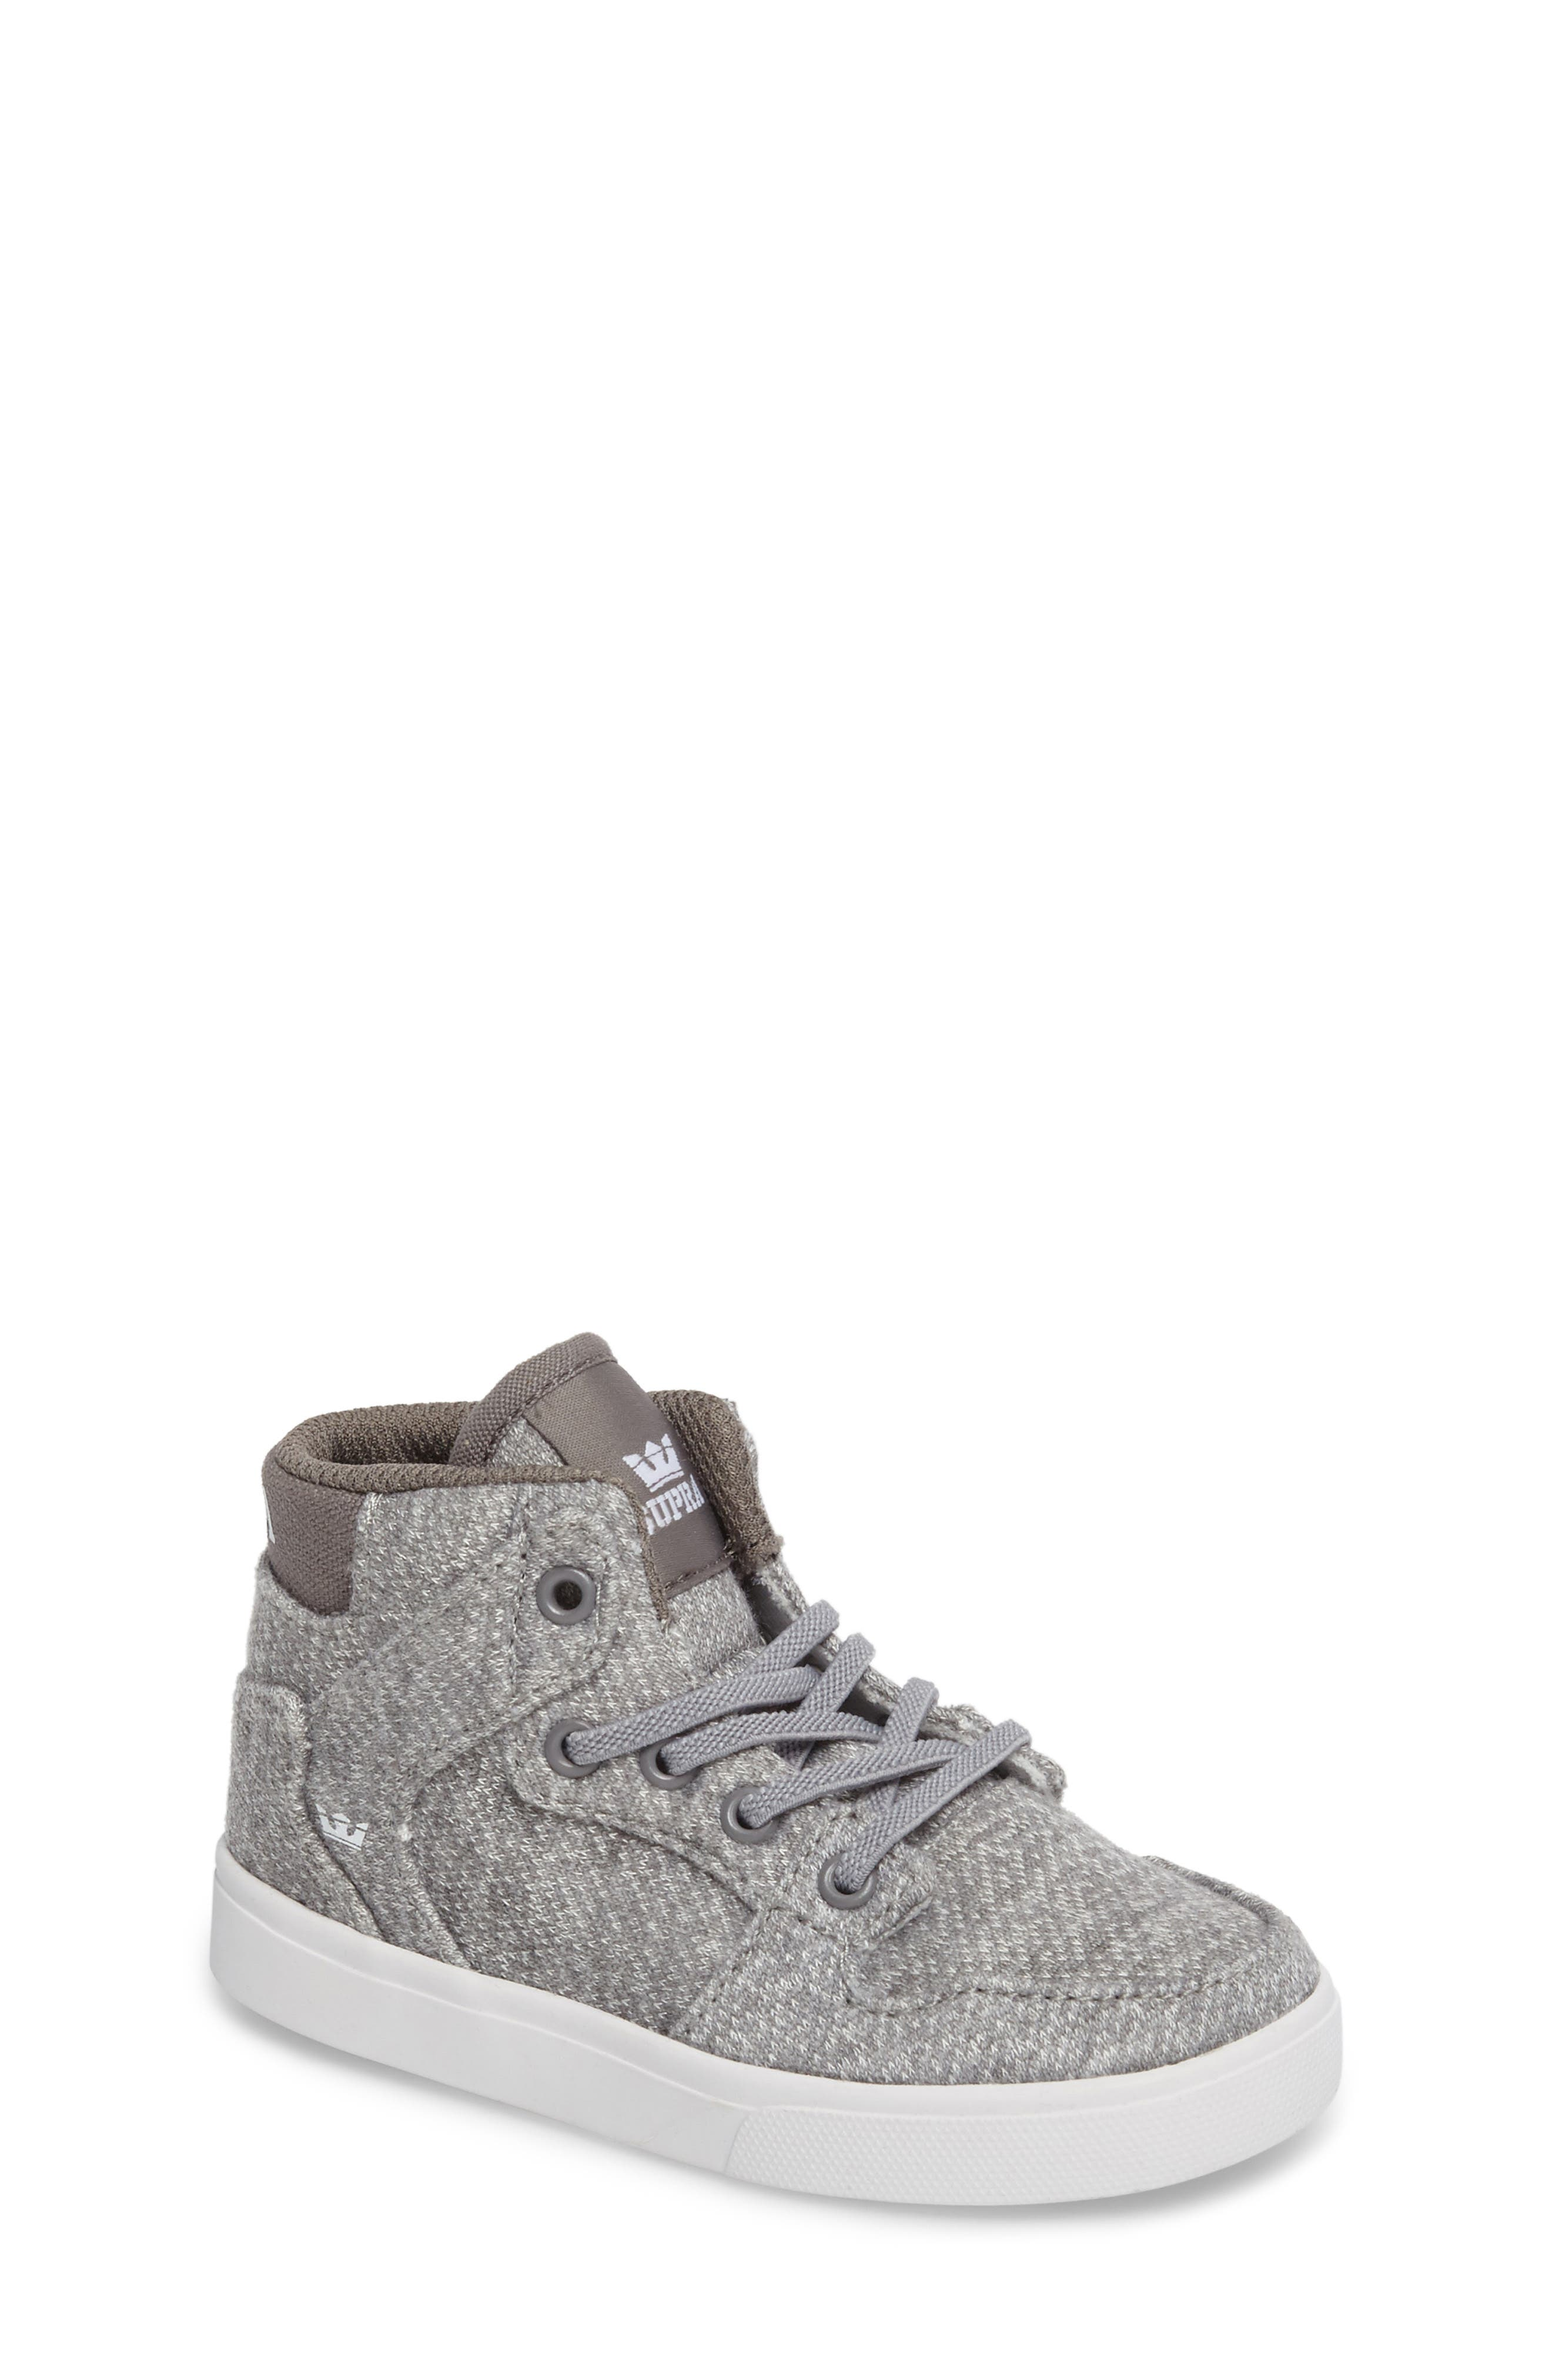 'Vaider' High Top Sneaker,                             Main thumbnail 1, color,                             Silver